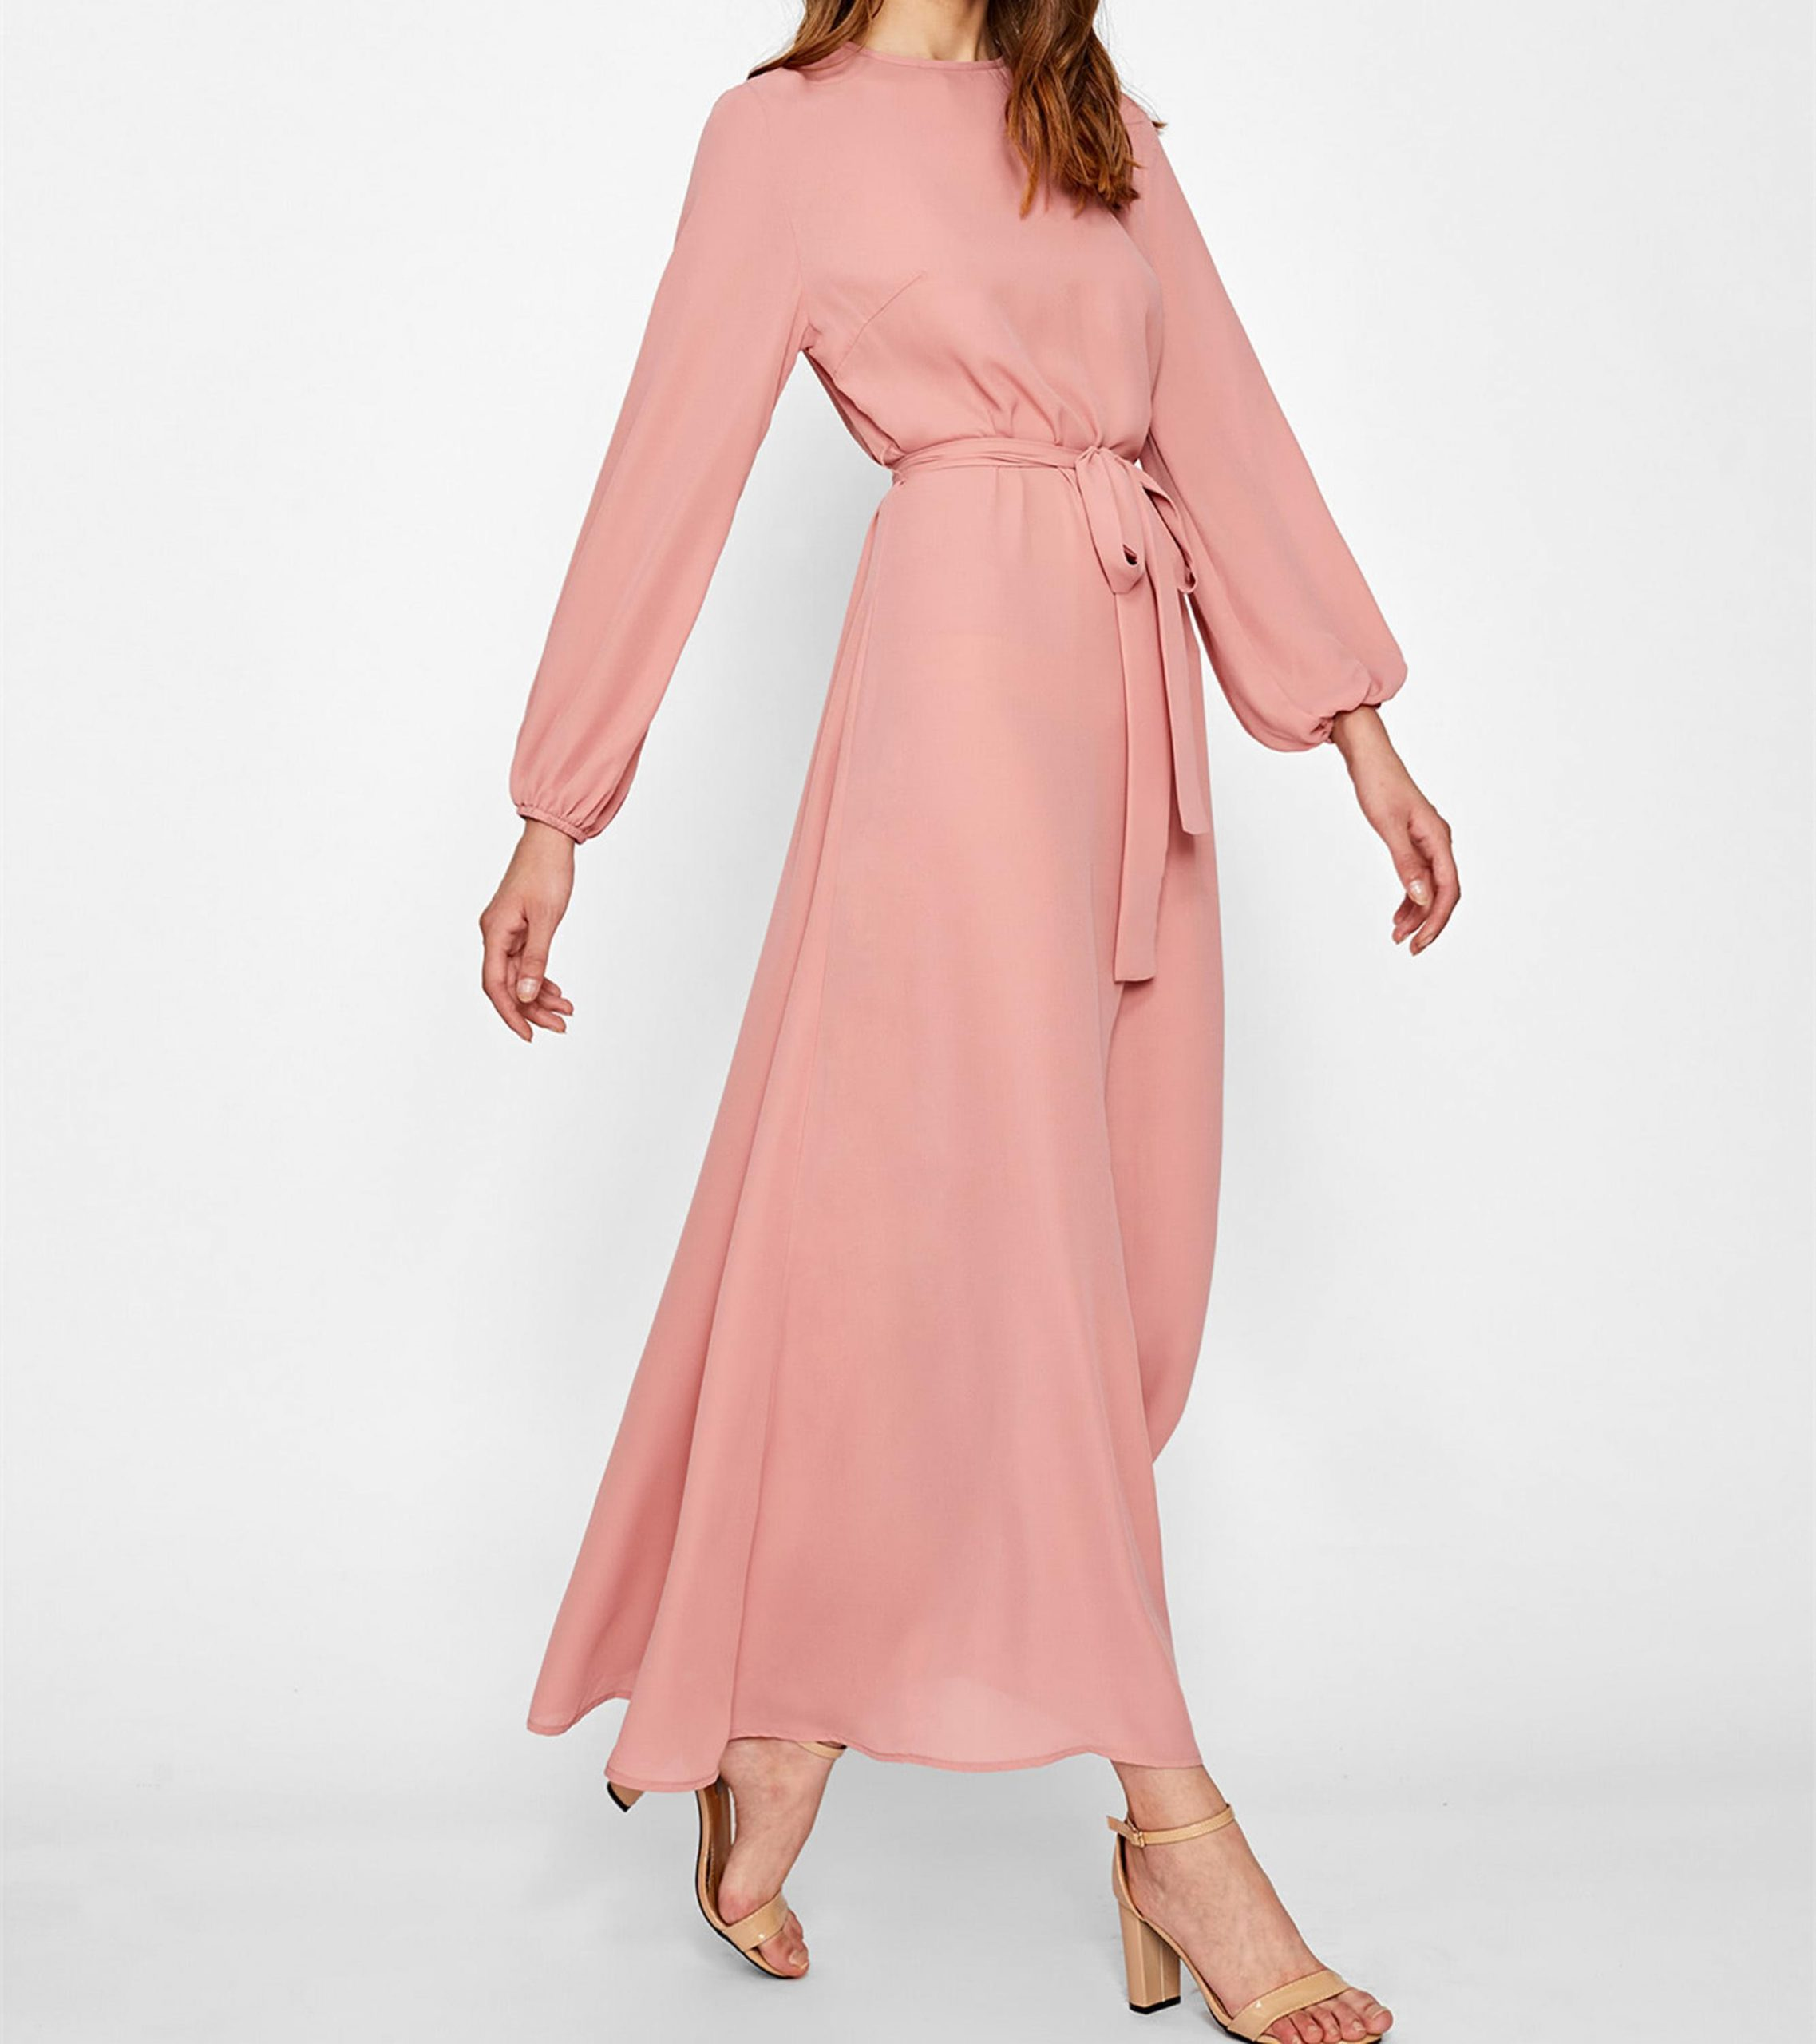 17 Cool Rosa Kleid Langarm BoutiqueFormal Genial Rosa Kleid Langarm Spezialgebiet